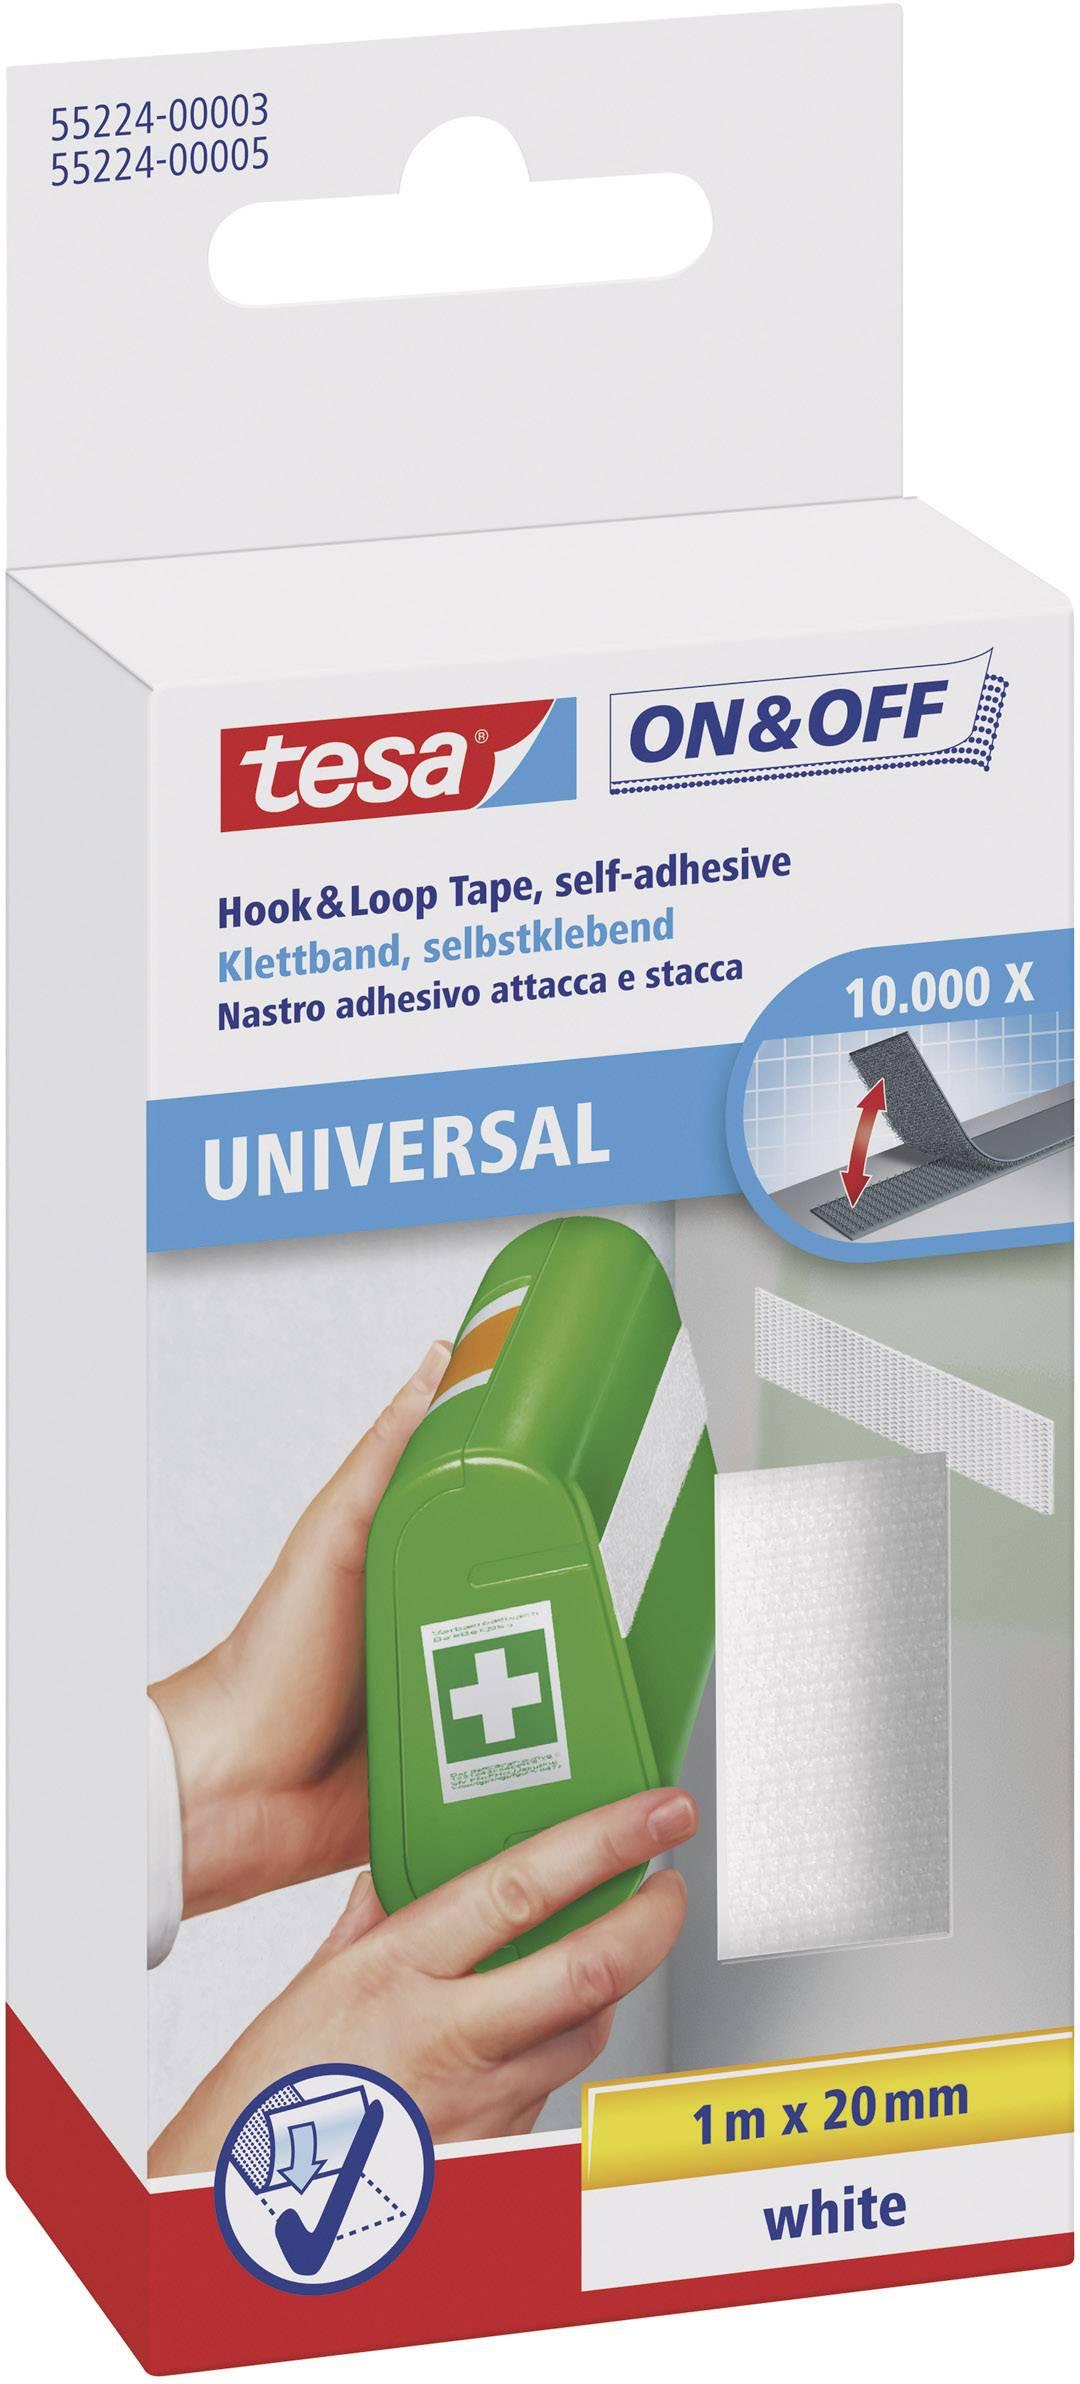 Lepiaci pásik so suchým zipsom TESA On & Off 55224-03-00, (d x š) 1000 mm x 20 mm, biela, 1 ks